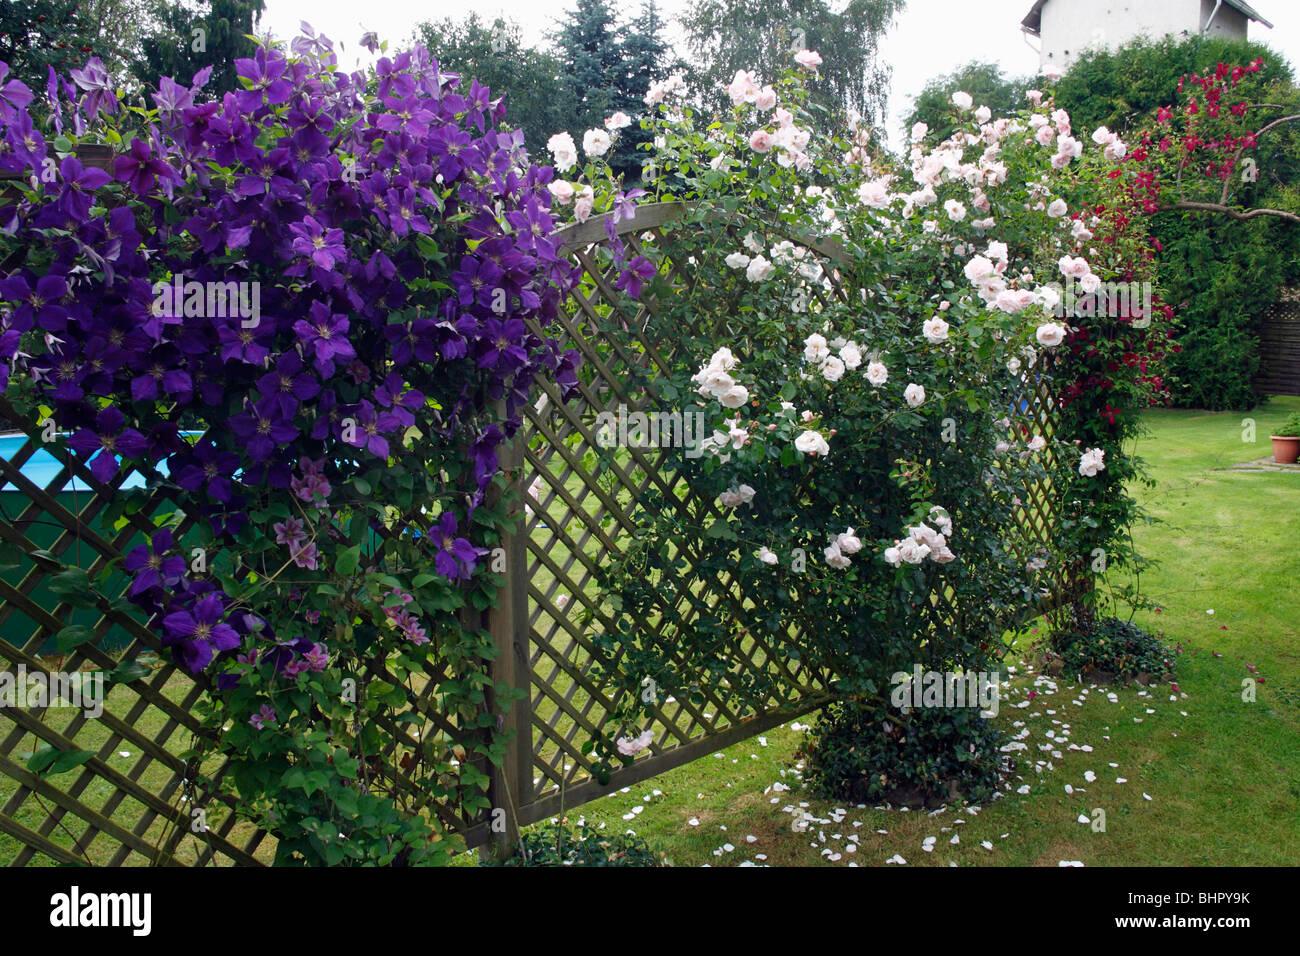 Flowering clematis x jackmanni and climbing rose growing on stock photo royalty free image - Climbing rose trellis ...